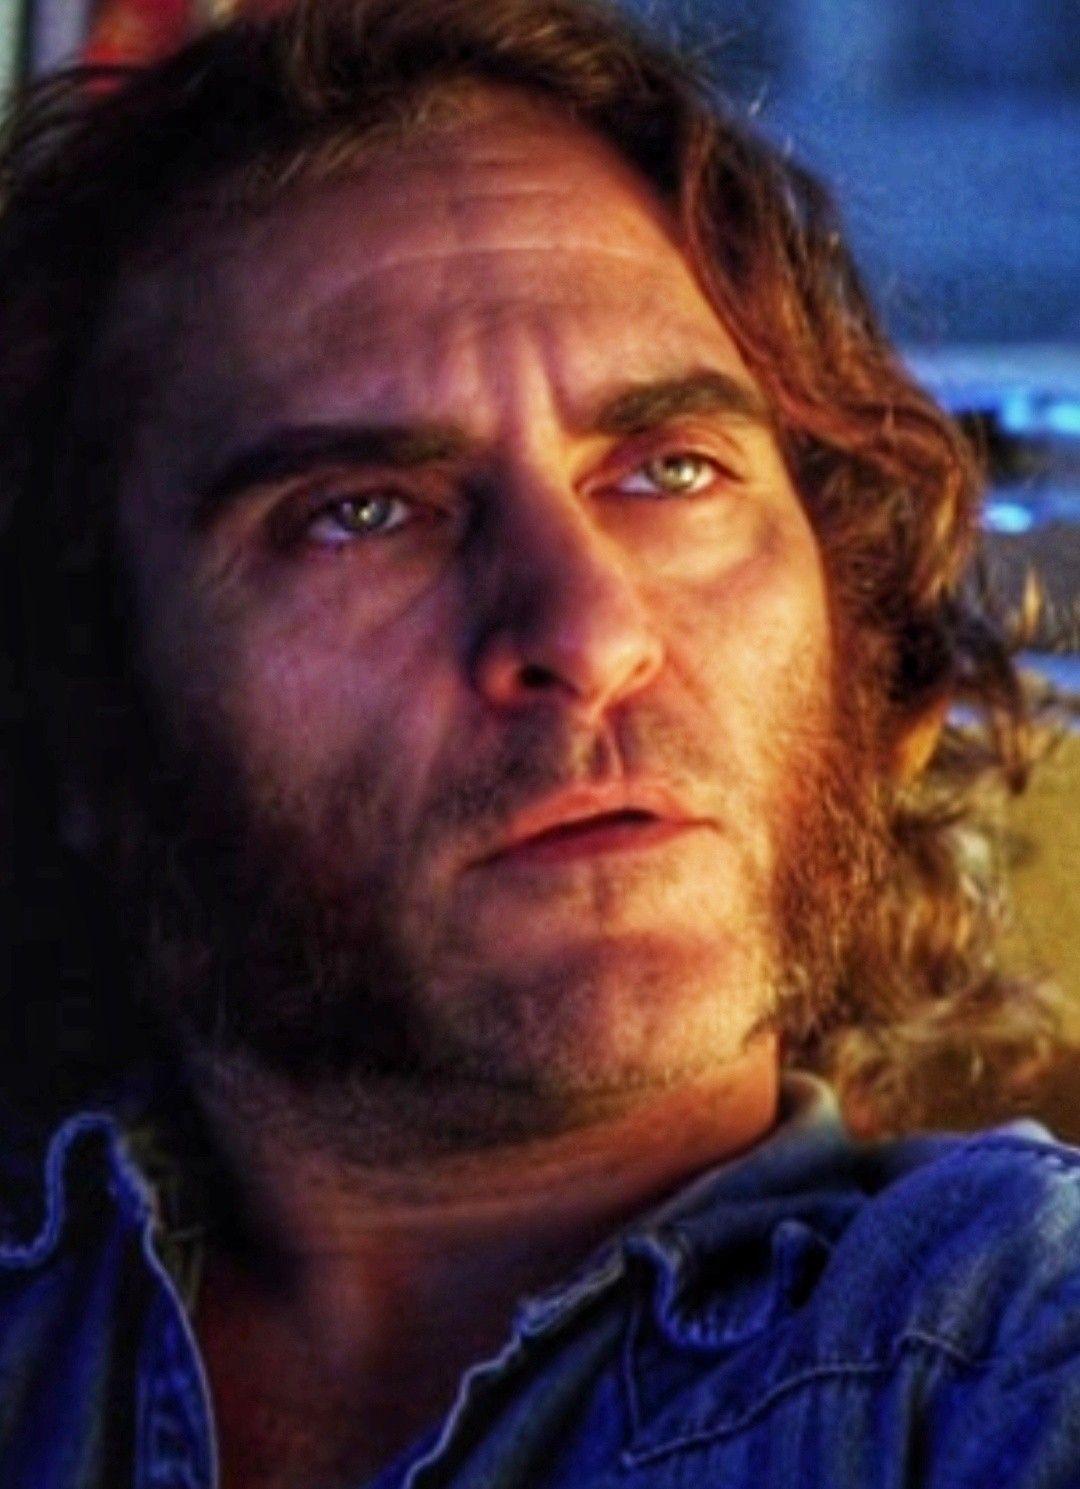 Pin By Berregall On Joaquin Phoenix Rain Phoenix Joaquin Phoenix Joaquin